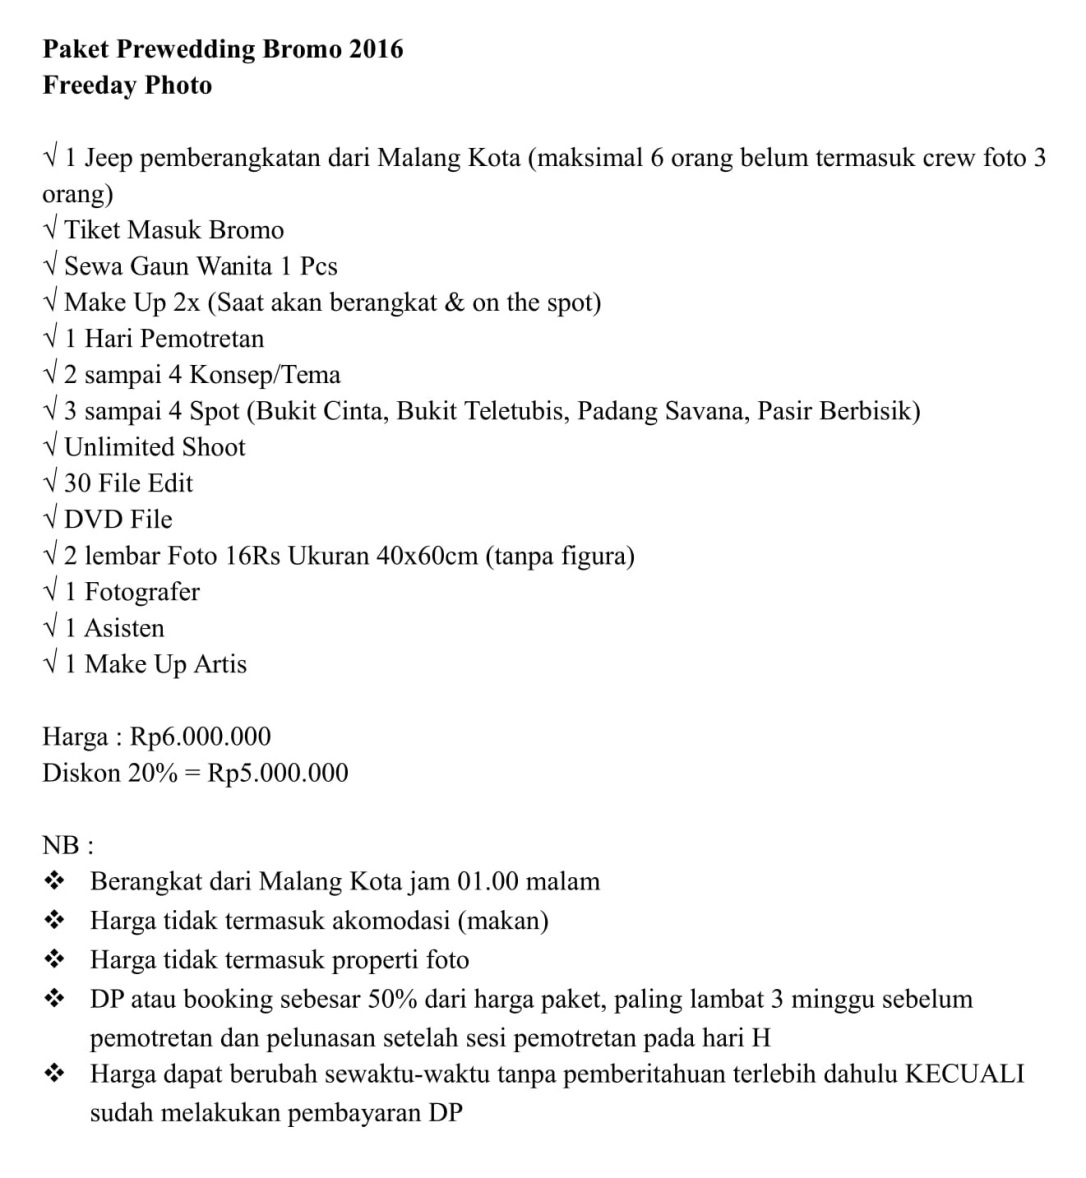 Paket Prewedding Bromo 2016-1